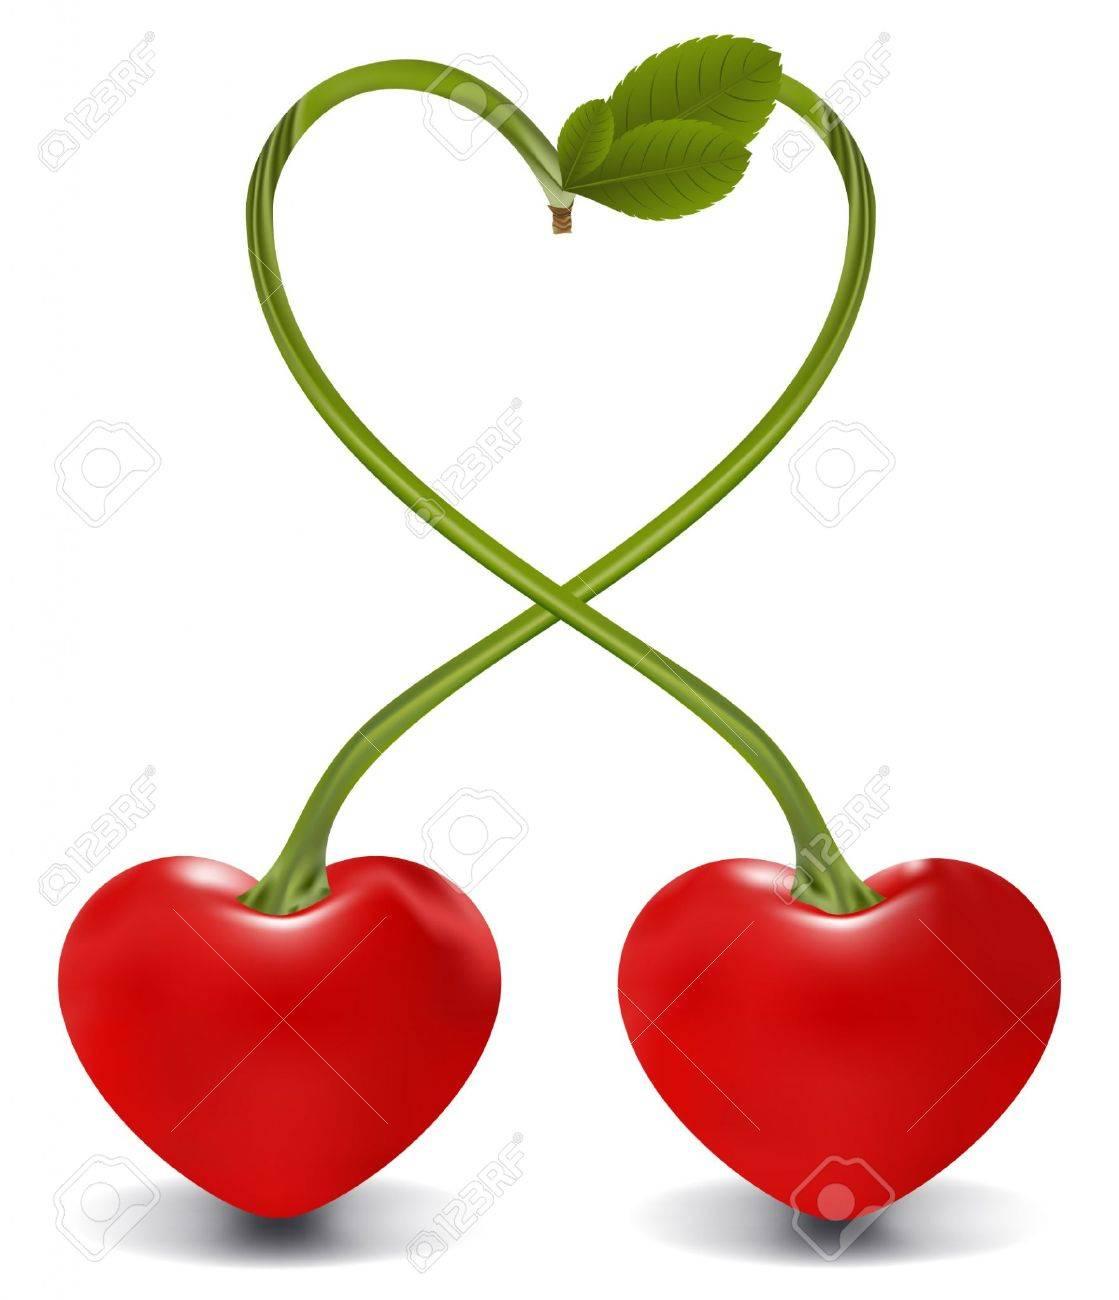 cherry heart in vector, contains gradient mesh elements Stock Vector - 5355310